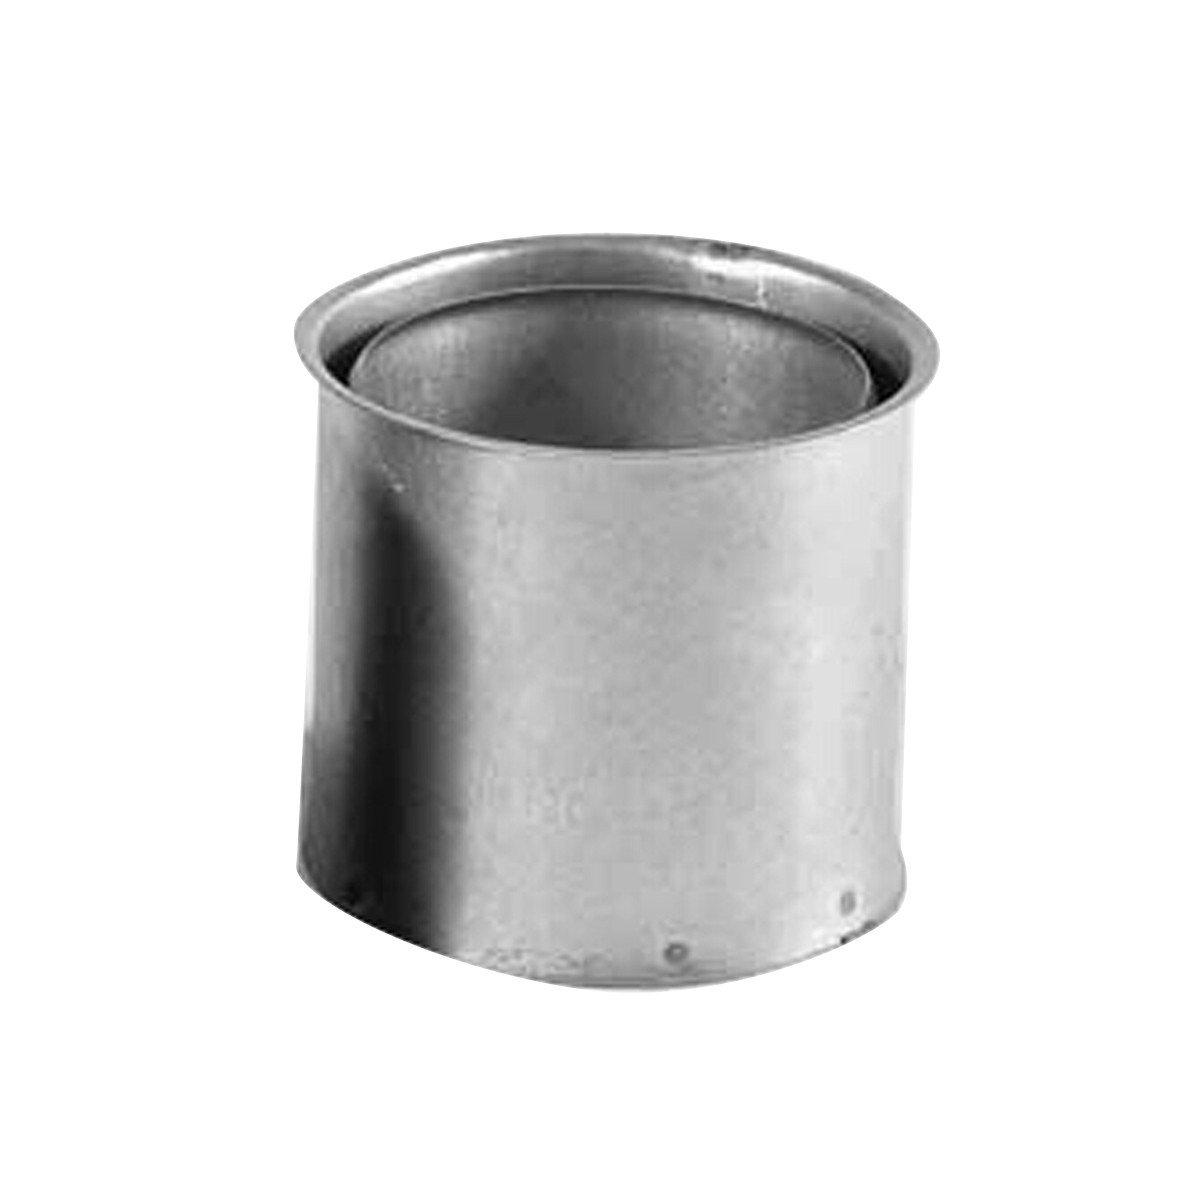 Kamino - Flam - Tubo para chimenea (Ø 150 mm/altura 120 mm), Tubos para estufa de leña, Conducto de humos, Tubo doble pared - acero resistente a altas ...